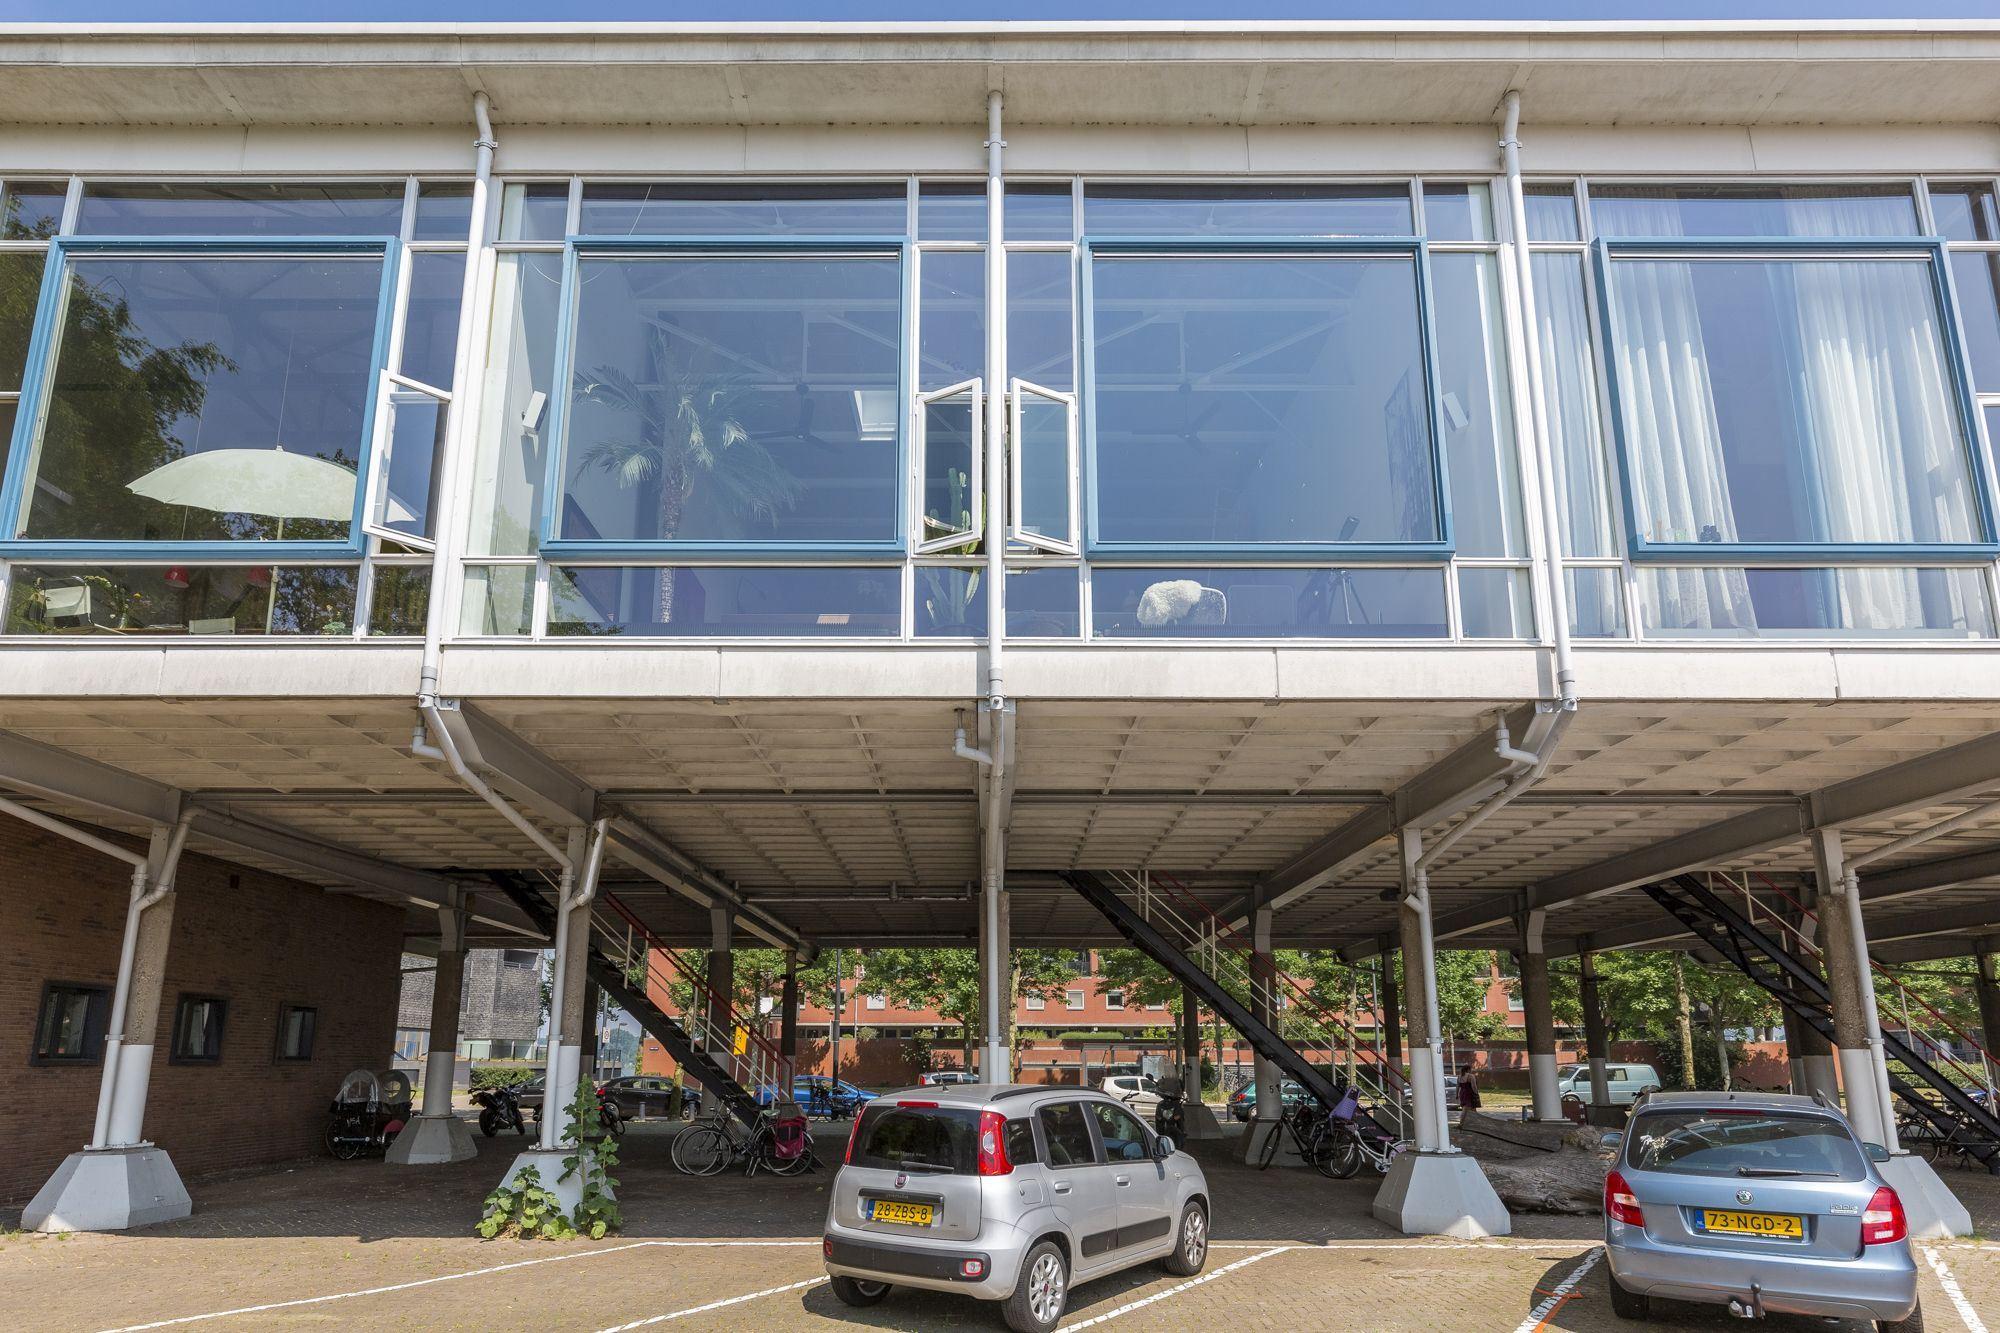 Inloopkast Knsm Loft : Verkocht: levantplein 5 1019 ma amsterdam [funda]